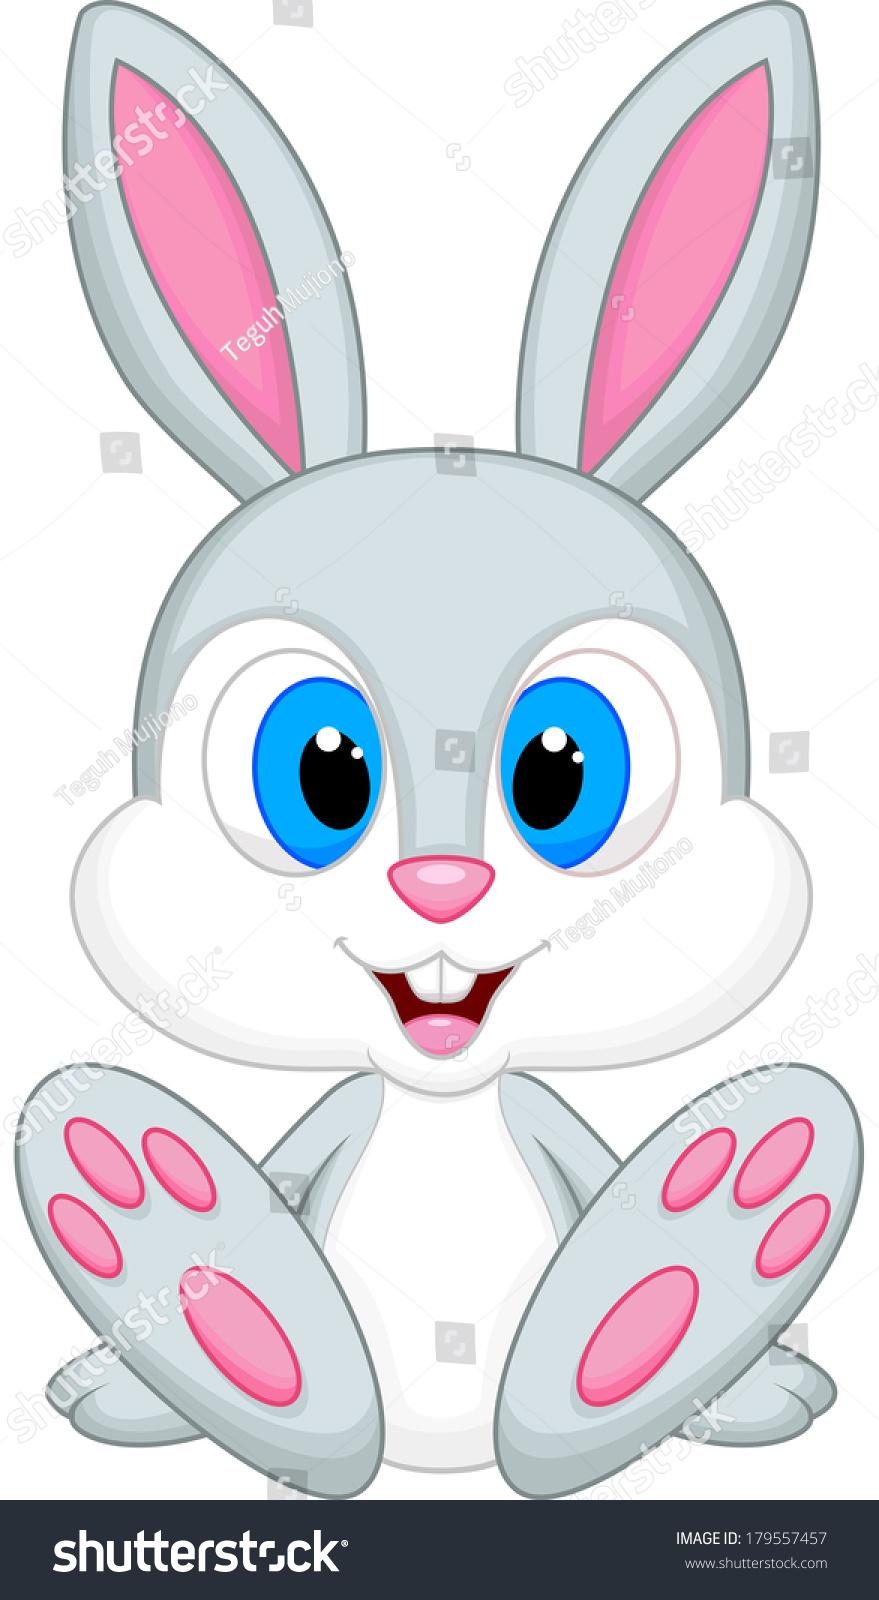 Cute Baby Rabbit Cartoon Stock Illustration 179557457 ...